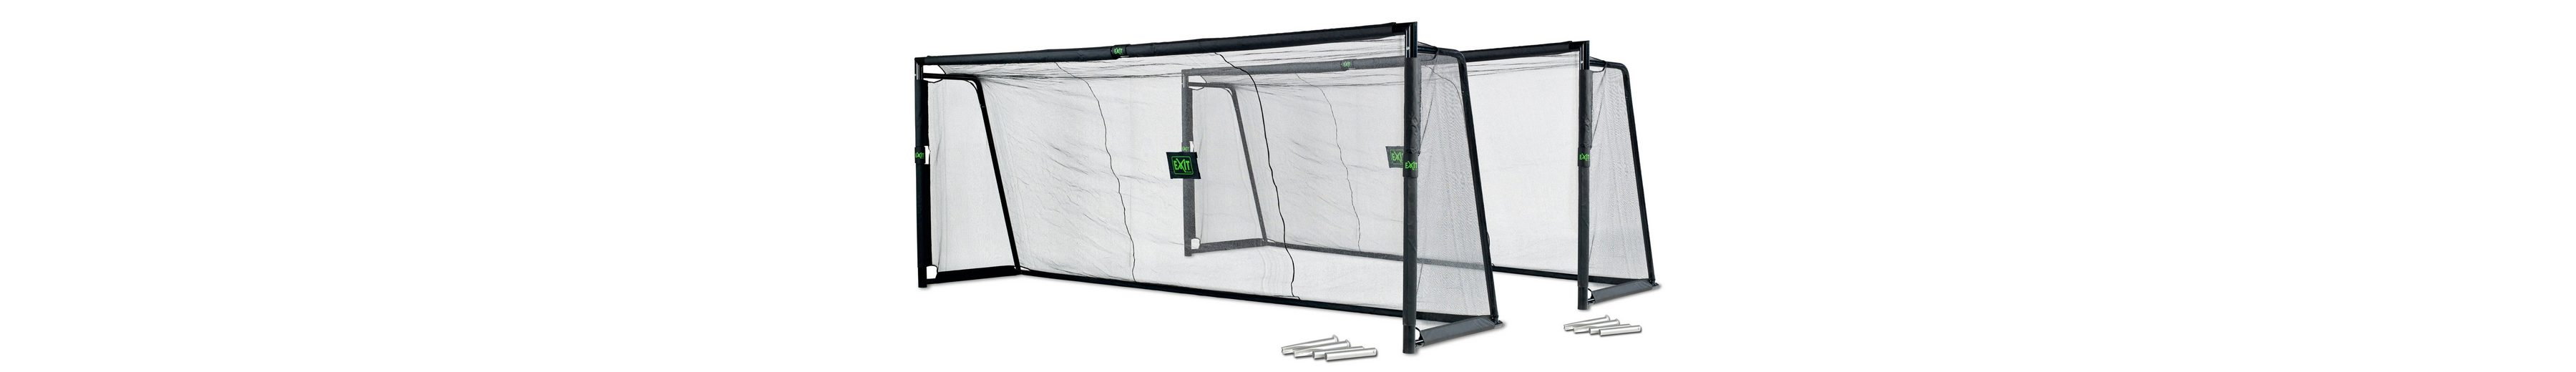 Set: Spielzeug »Fußballtor Forza Goal«, B/T/H: 500/119/200 cm, 2 Stk.